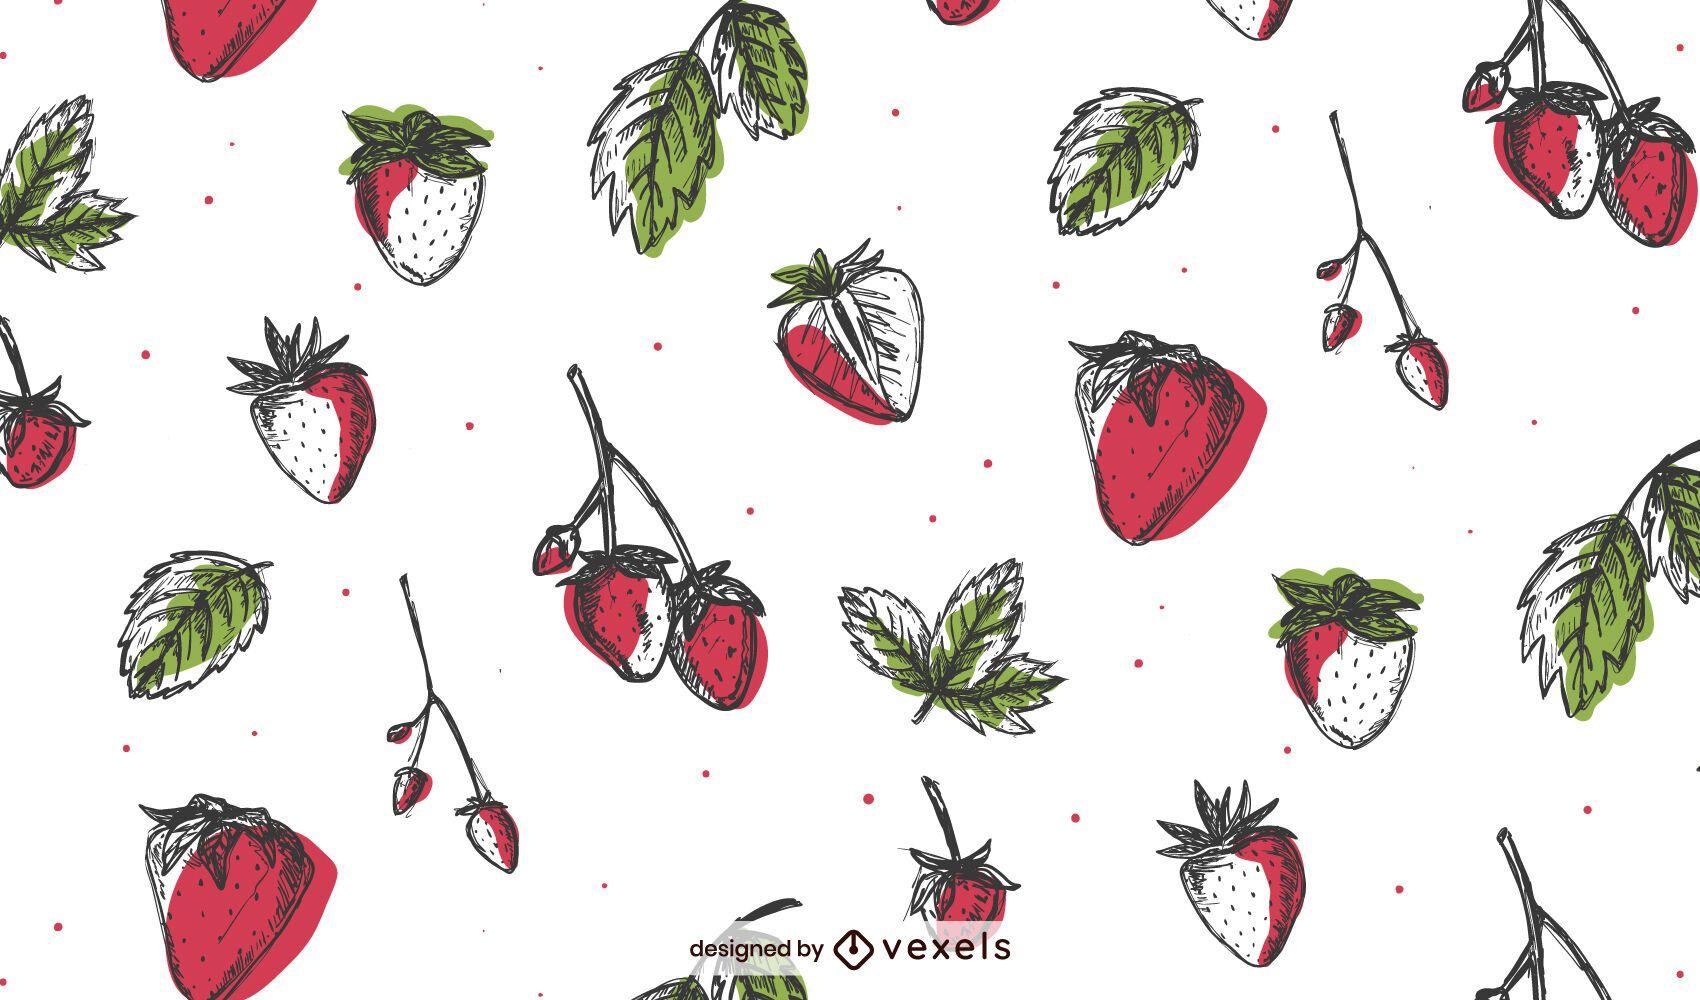 Dise?o de patr?n de fresas dibujadas a mano